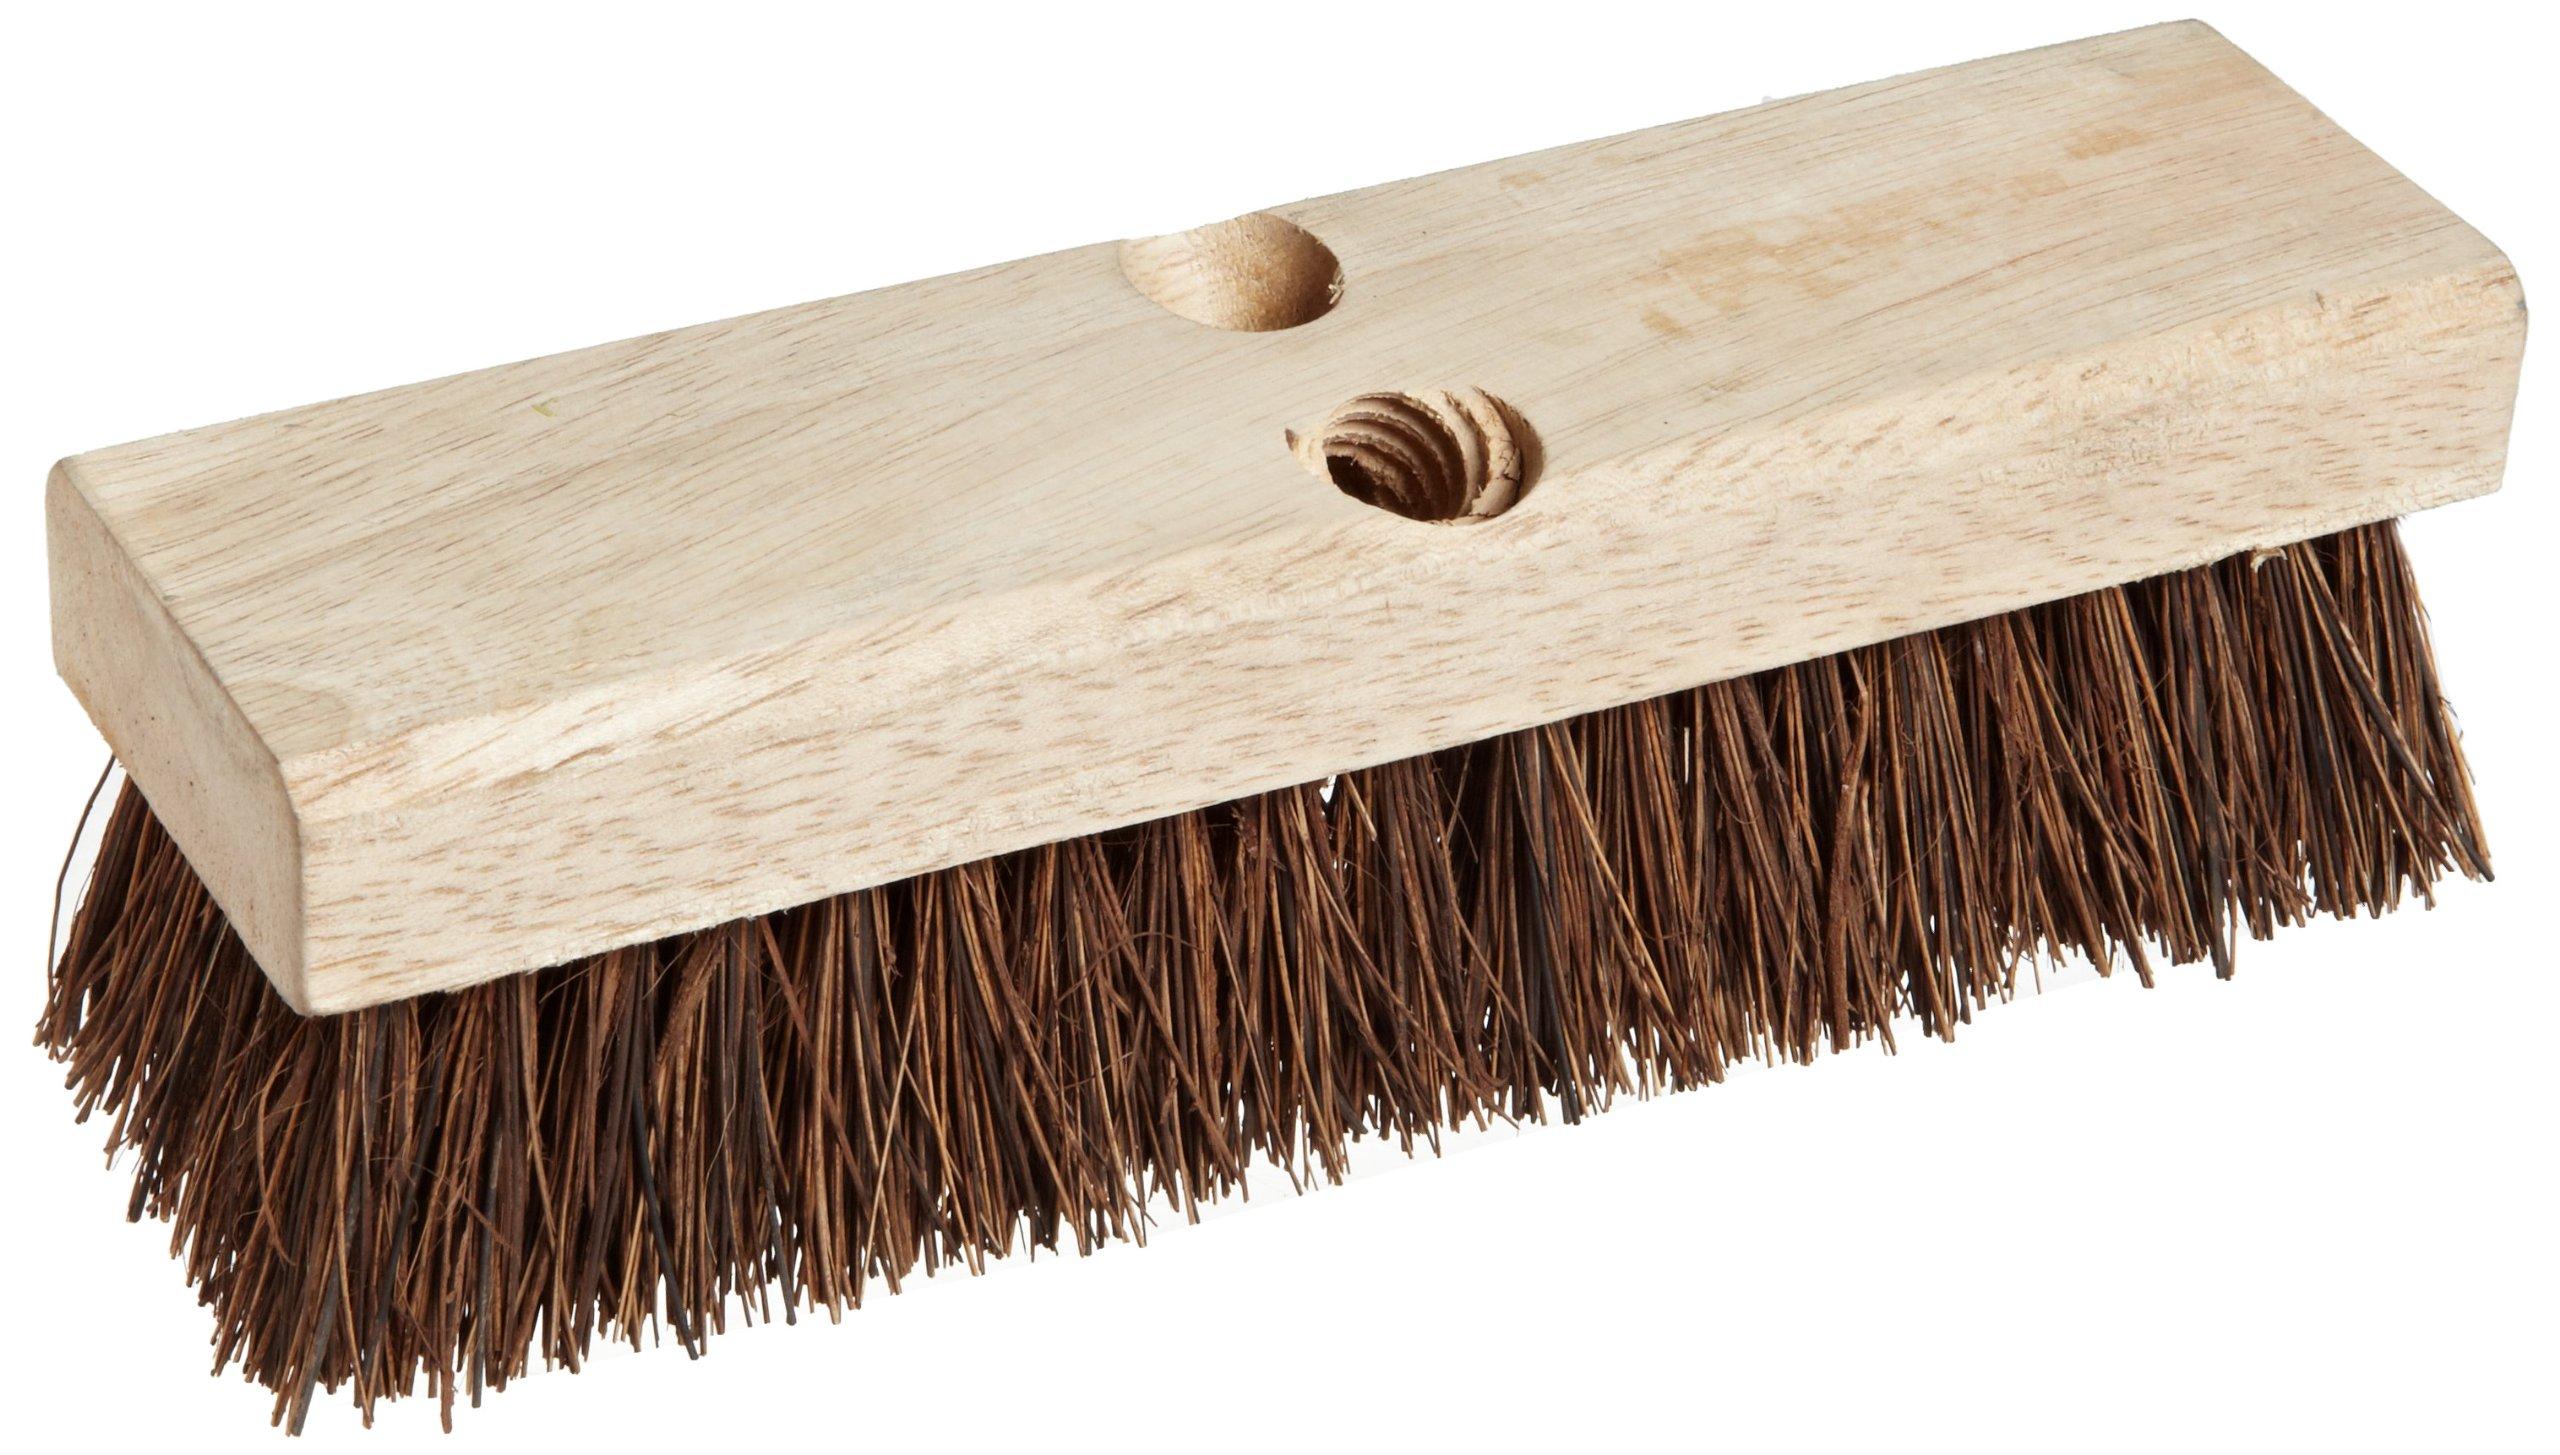 Wood block scrub brush